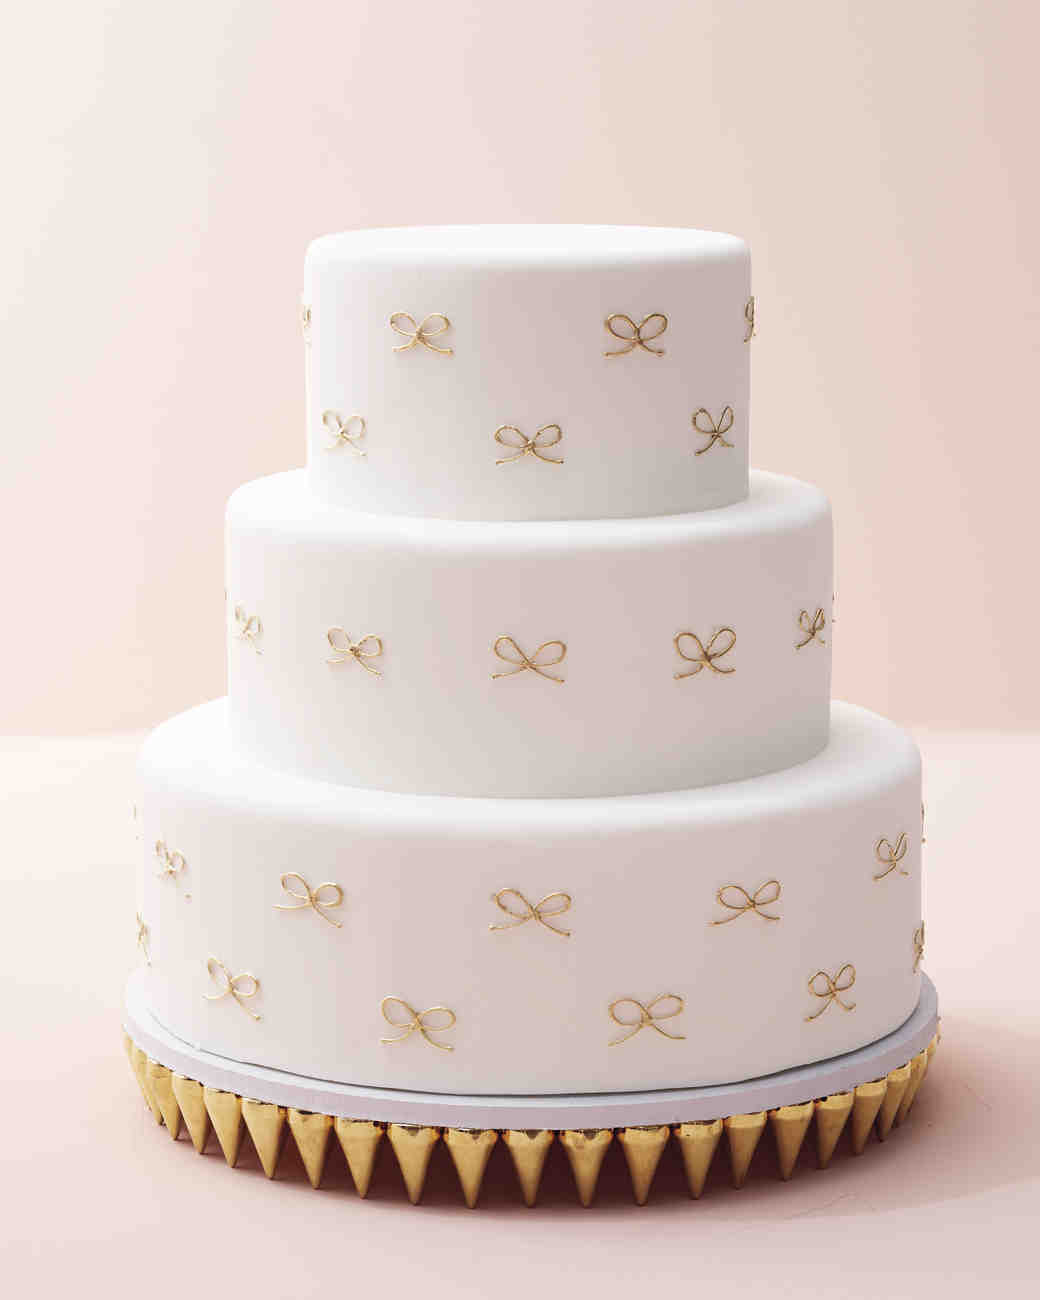 cake-studs-021-d111930.jpg